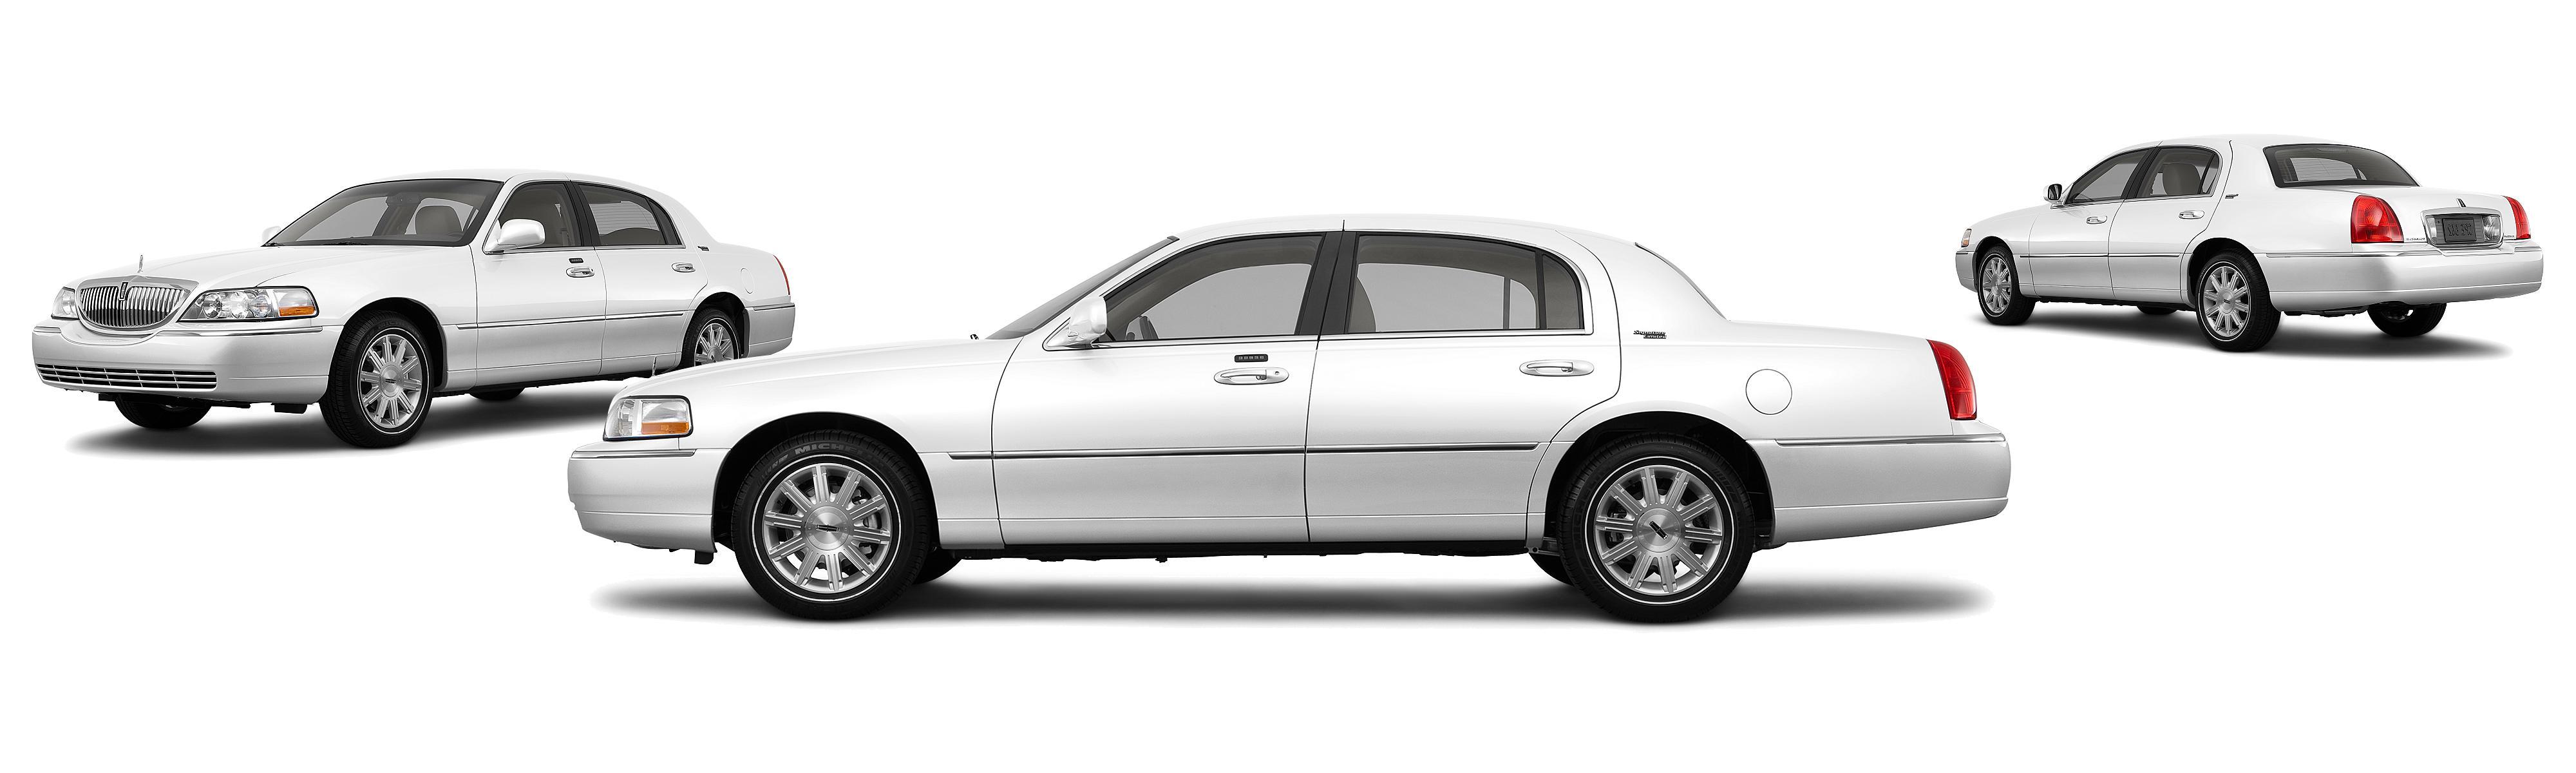 2011 Lincoln Town Car Executive L 4dr Sedan Research Groovecar